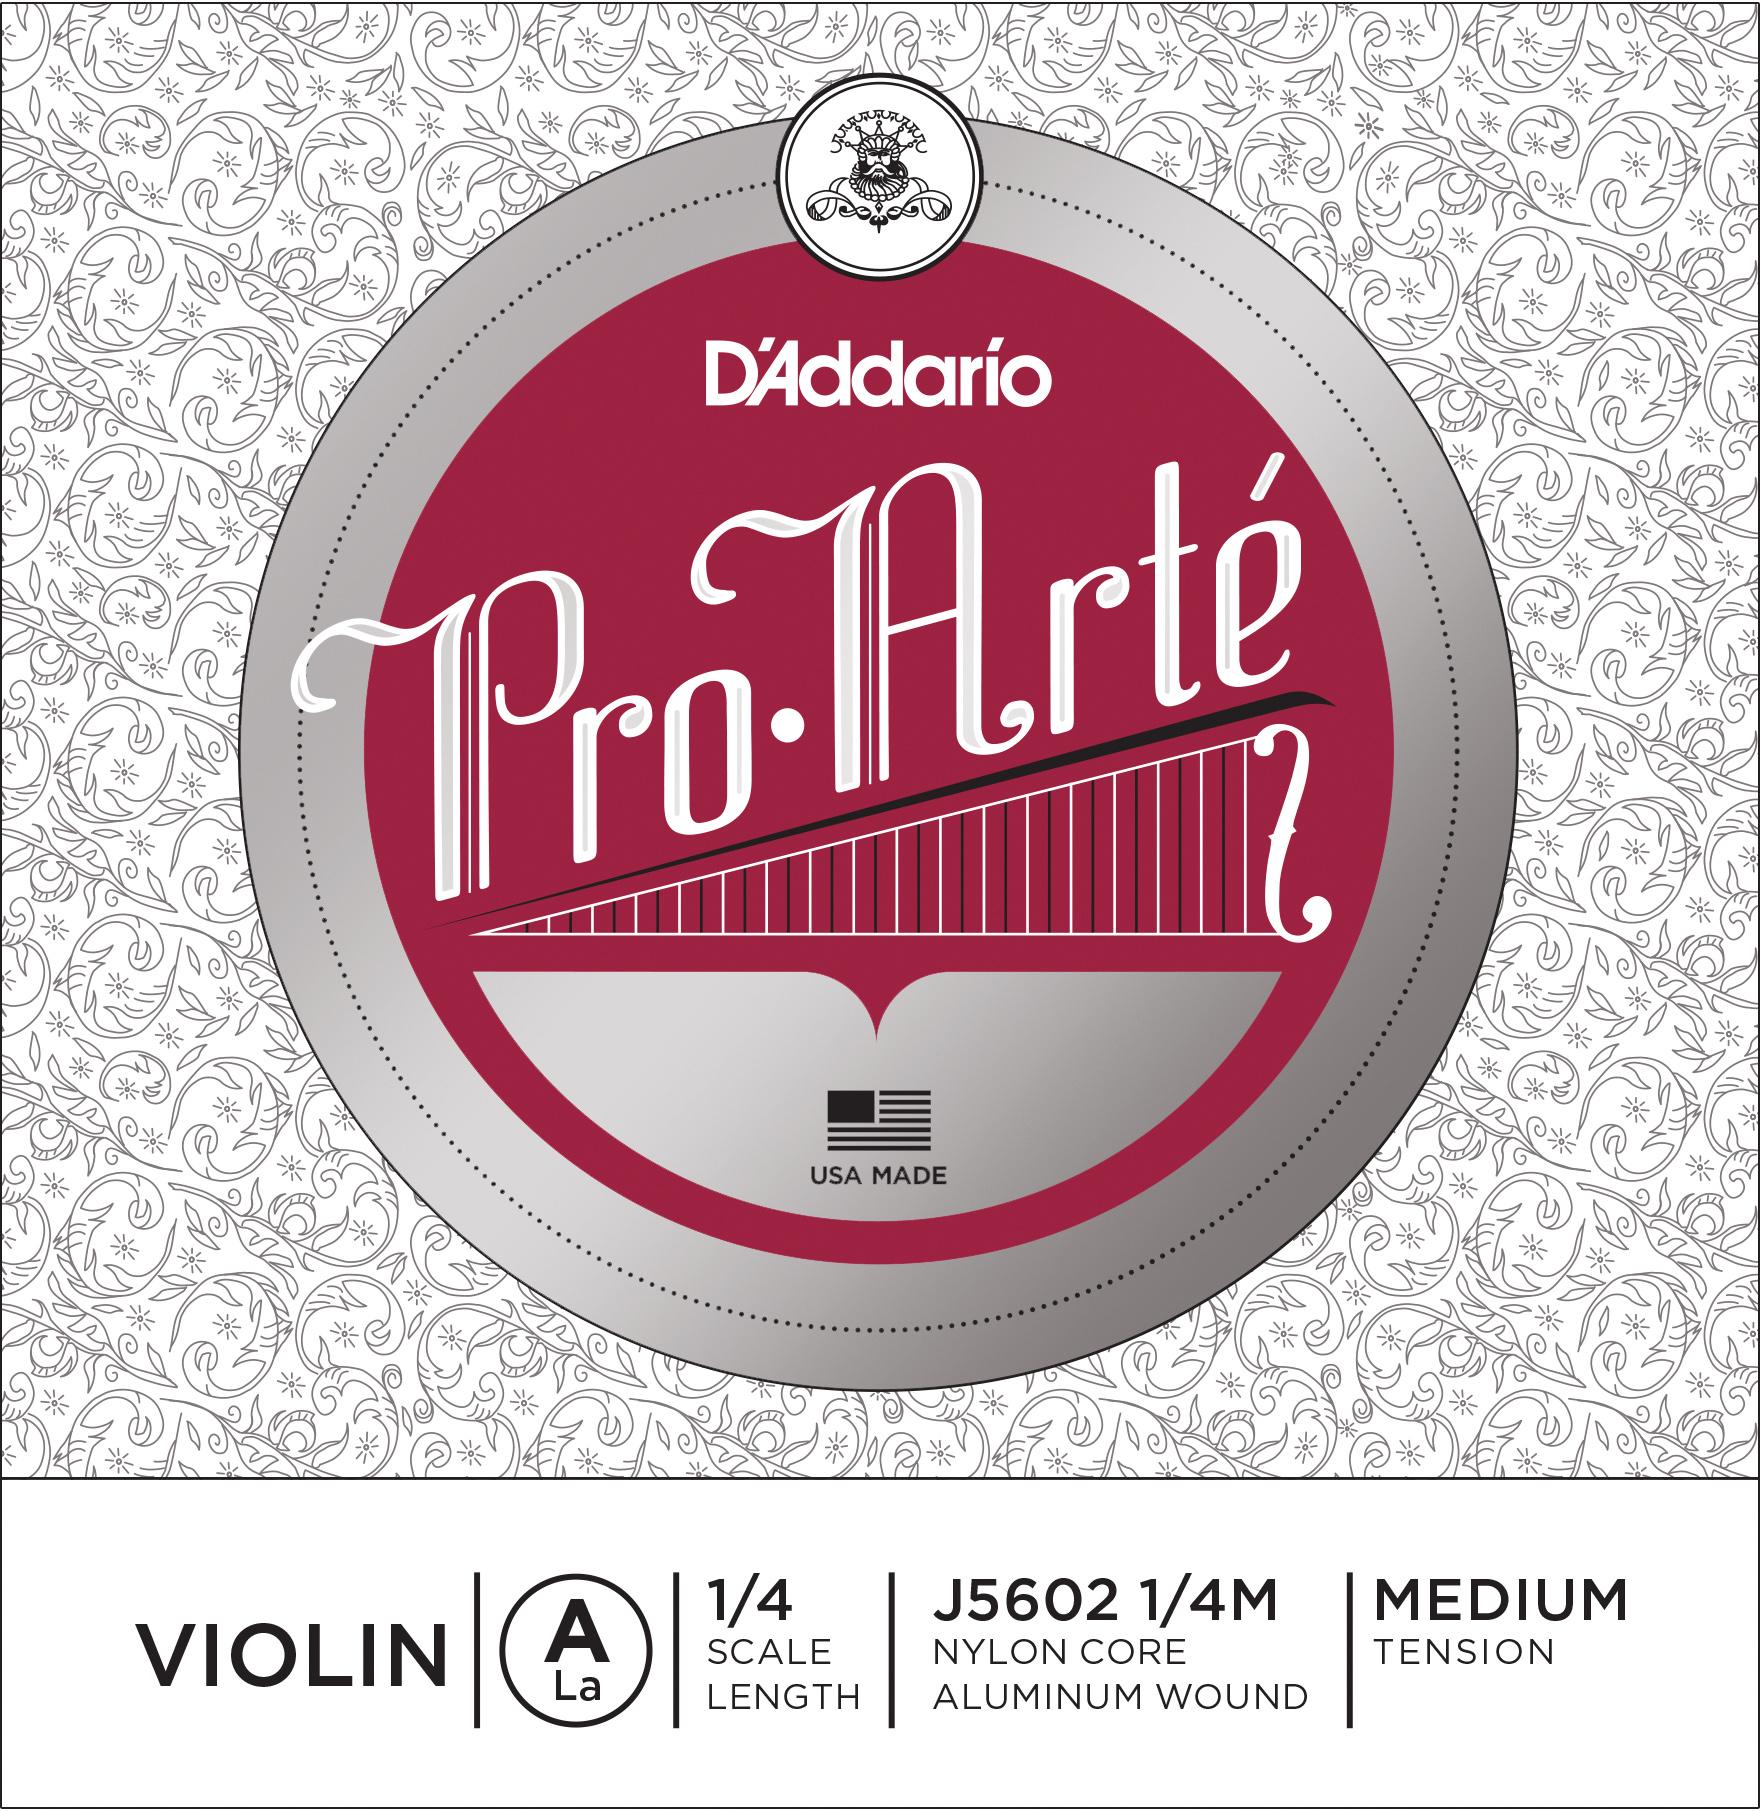 D'Addario Pro-Arte Violin Single A String 1/4 Scale Medium Tension